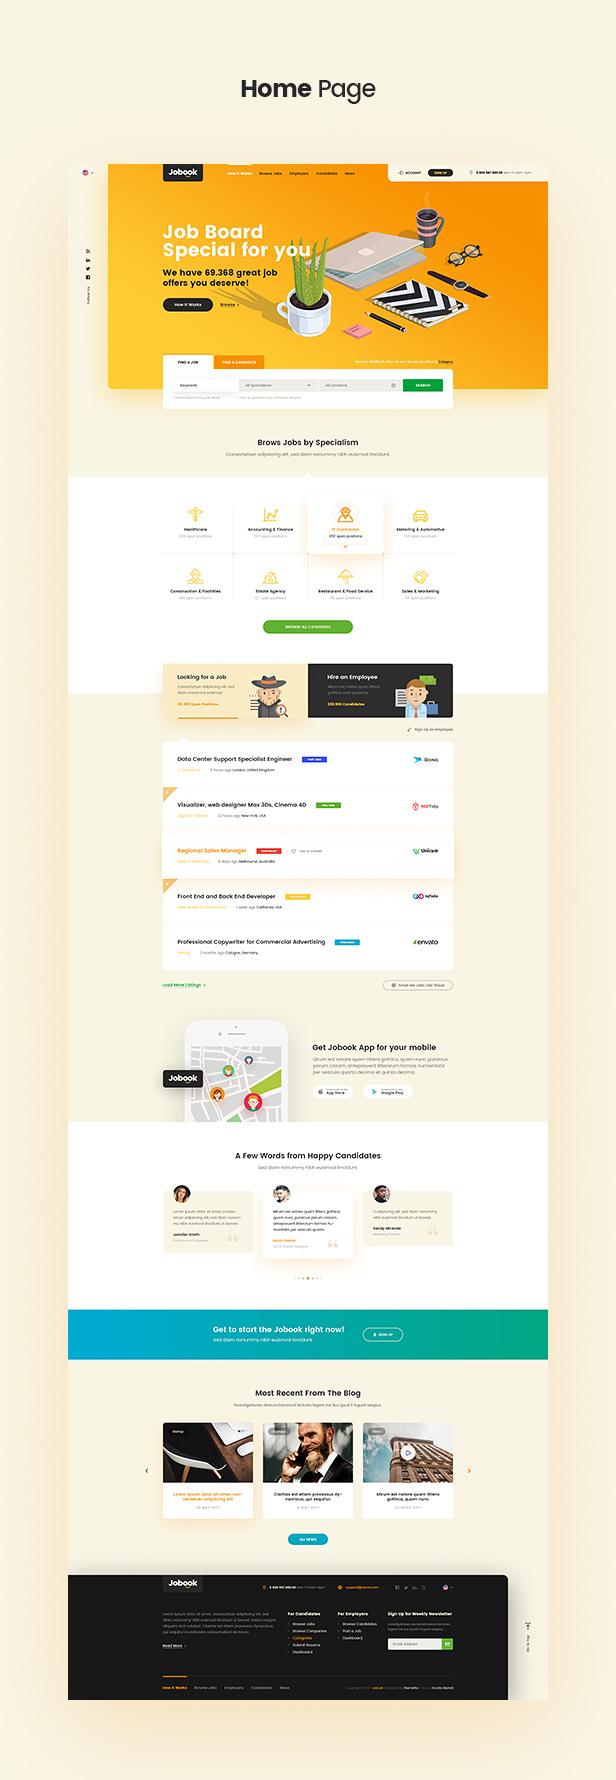 Jobook - A Unique Job Board Website PSD Template - 2